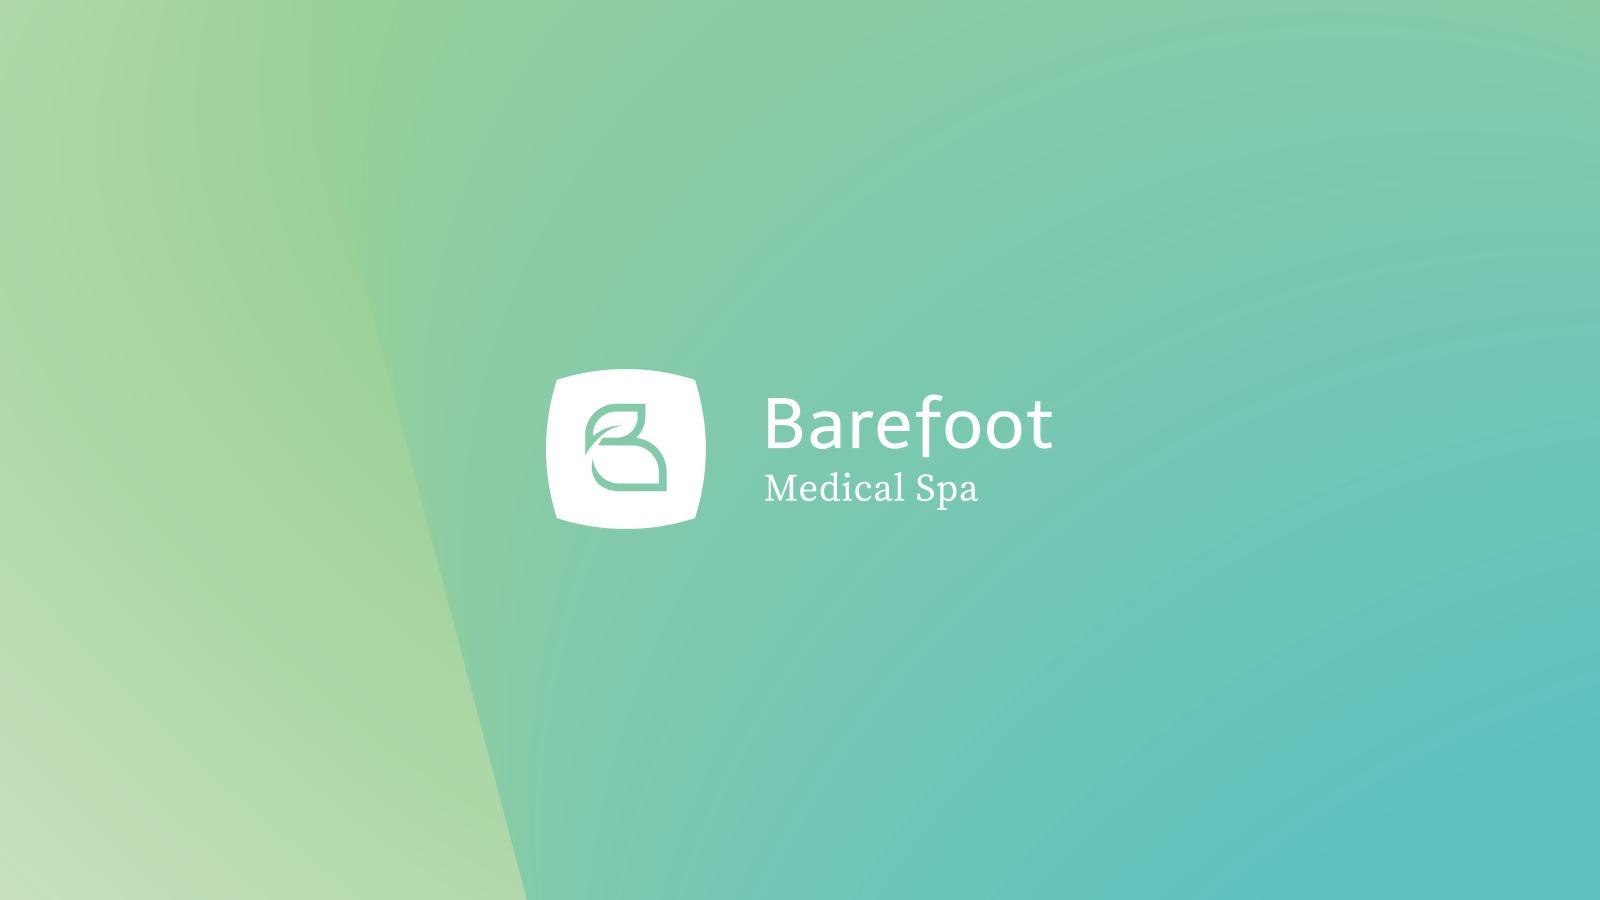 Barefoot_logo Design